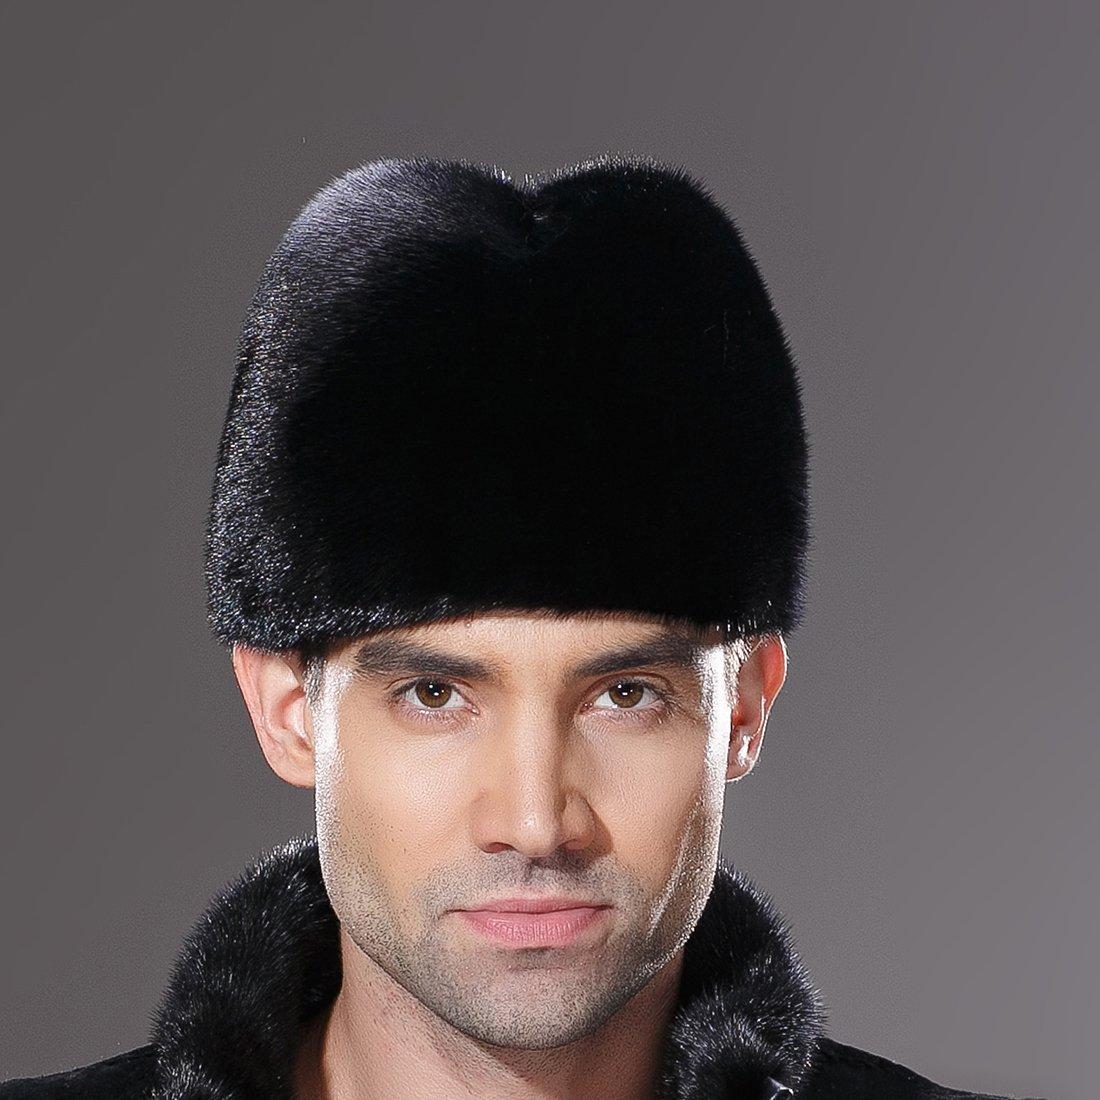 URSFUR Mens Winter Russian Cossack Hat Real Mink Fur Cap Black by URSFUR (Image #4)